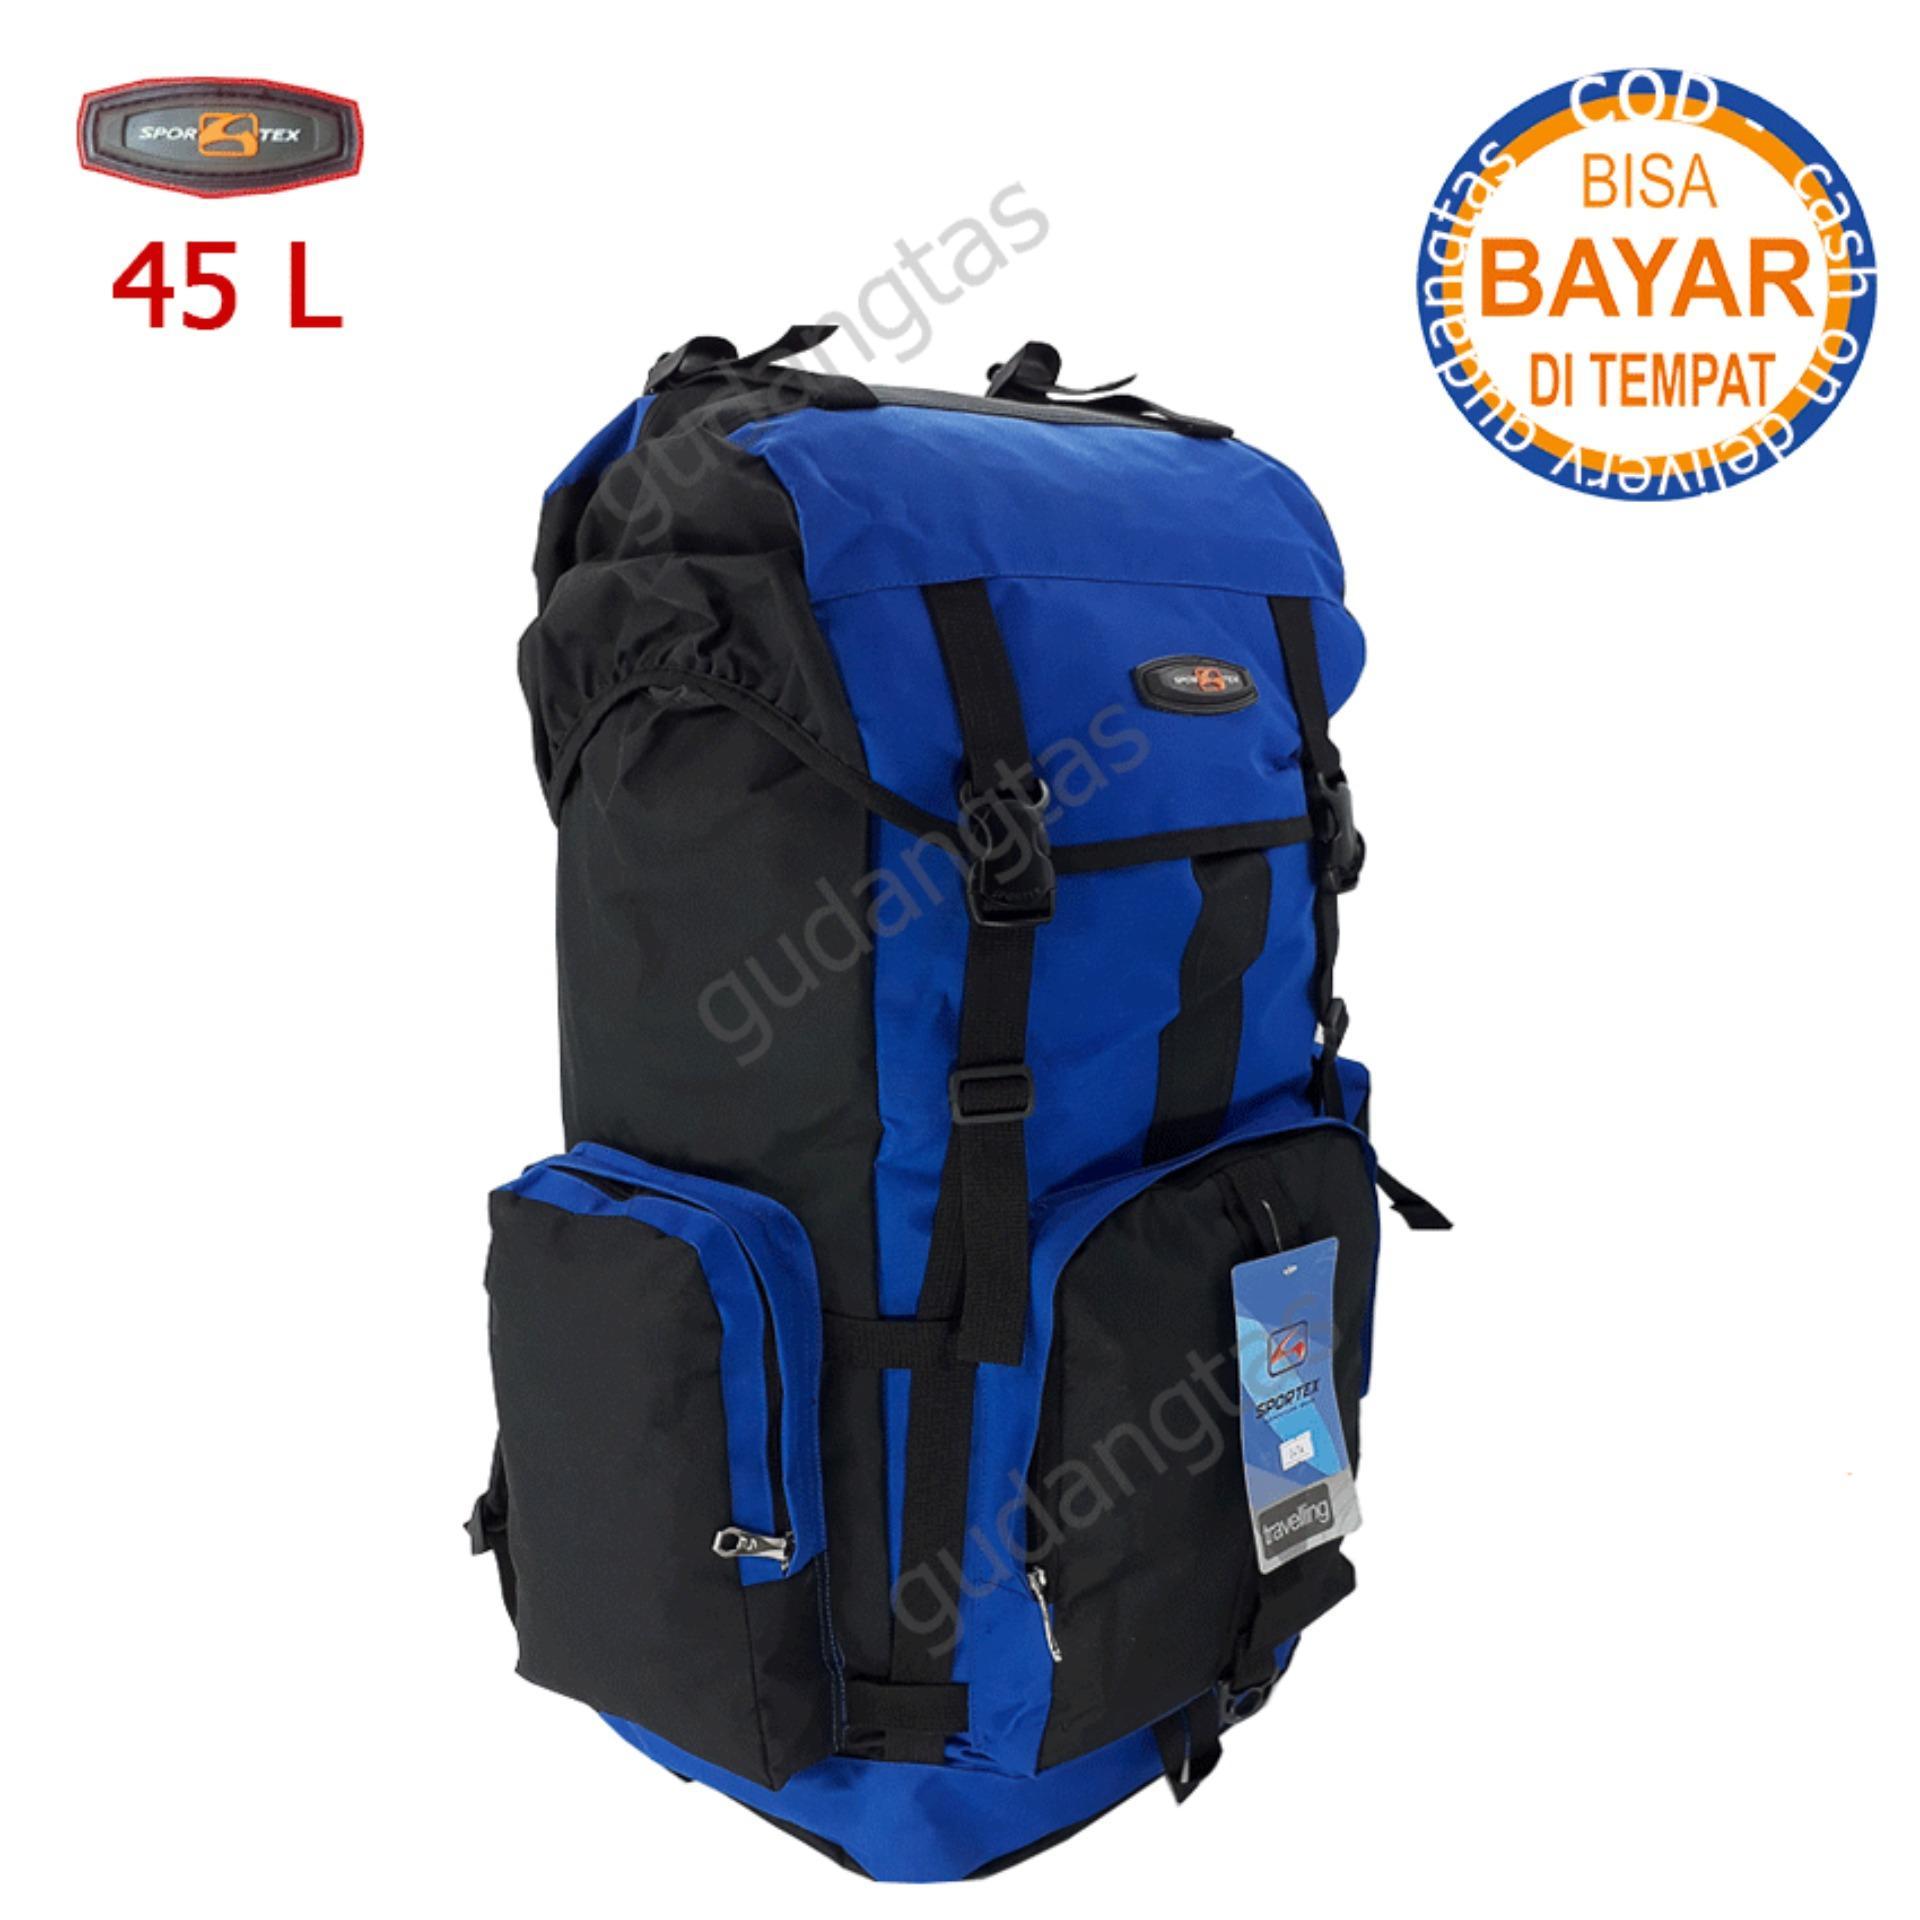 Sportex Tas Gunung Tas Keril Tas Carrier Ransel Camping Tas Hiking 45L  04YY40L Biru Terang kombinasi Hitam